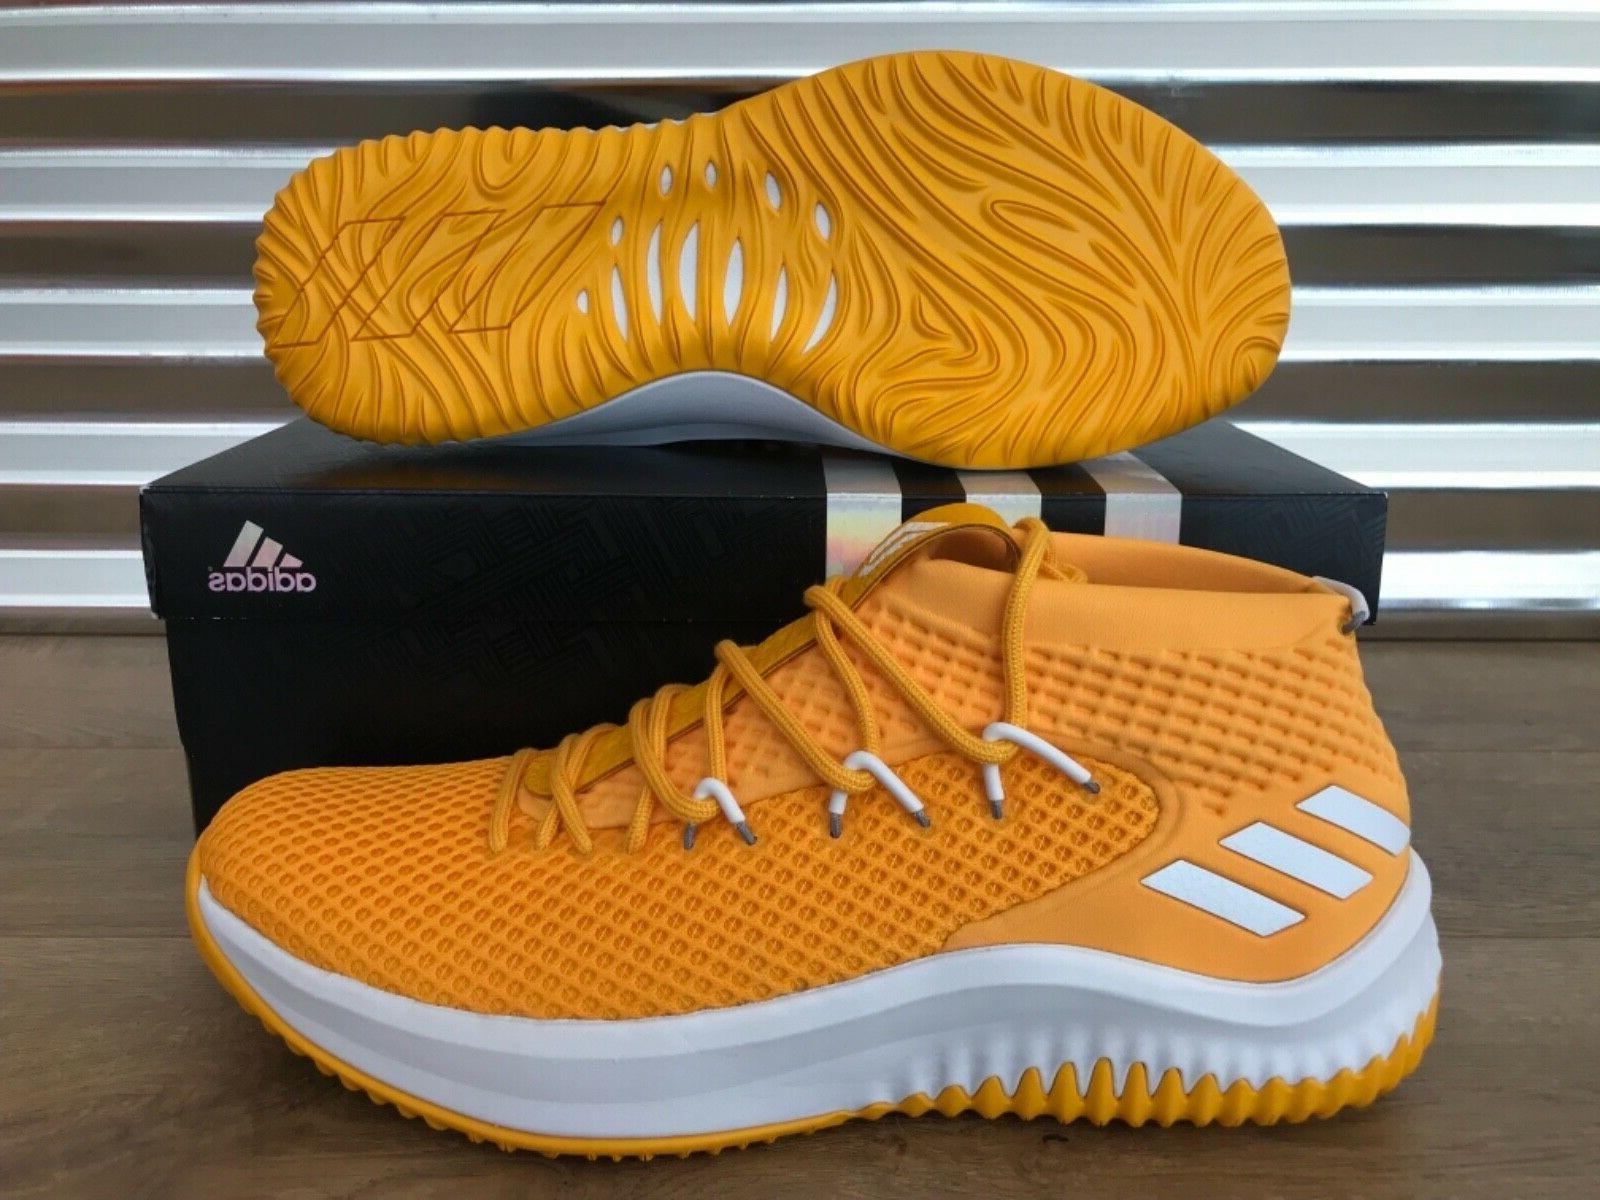 Adidas SM NBA Basketball Yellow Gold NIB